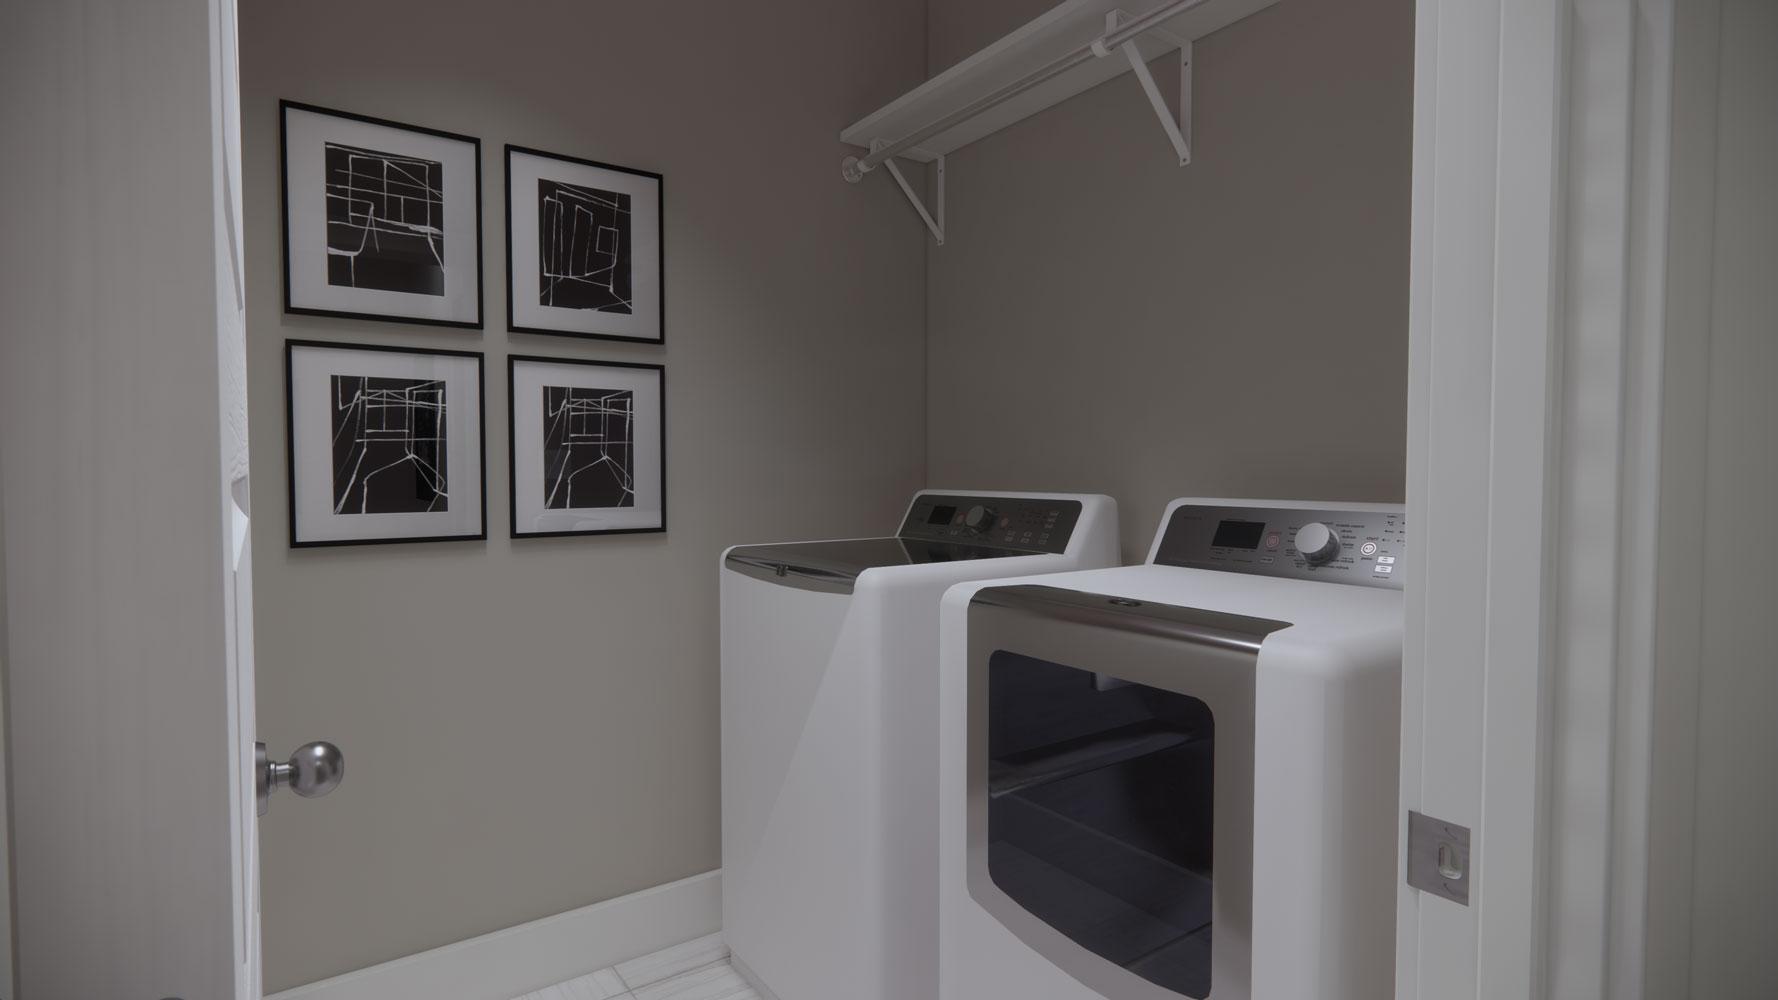 Laundry Room at Echelon at Reverchon Bluffs in Dallas, Texas